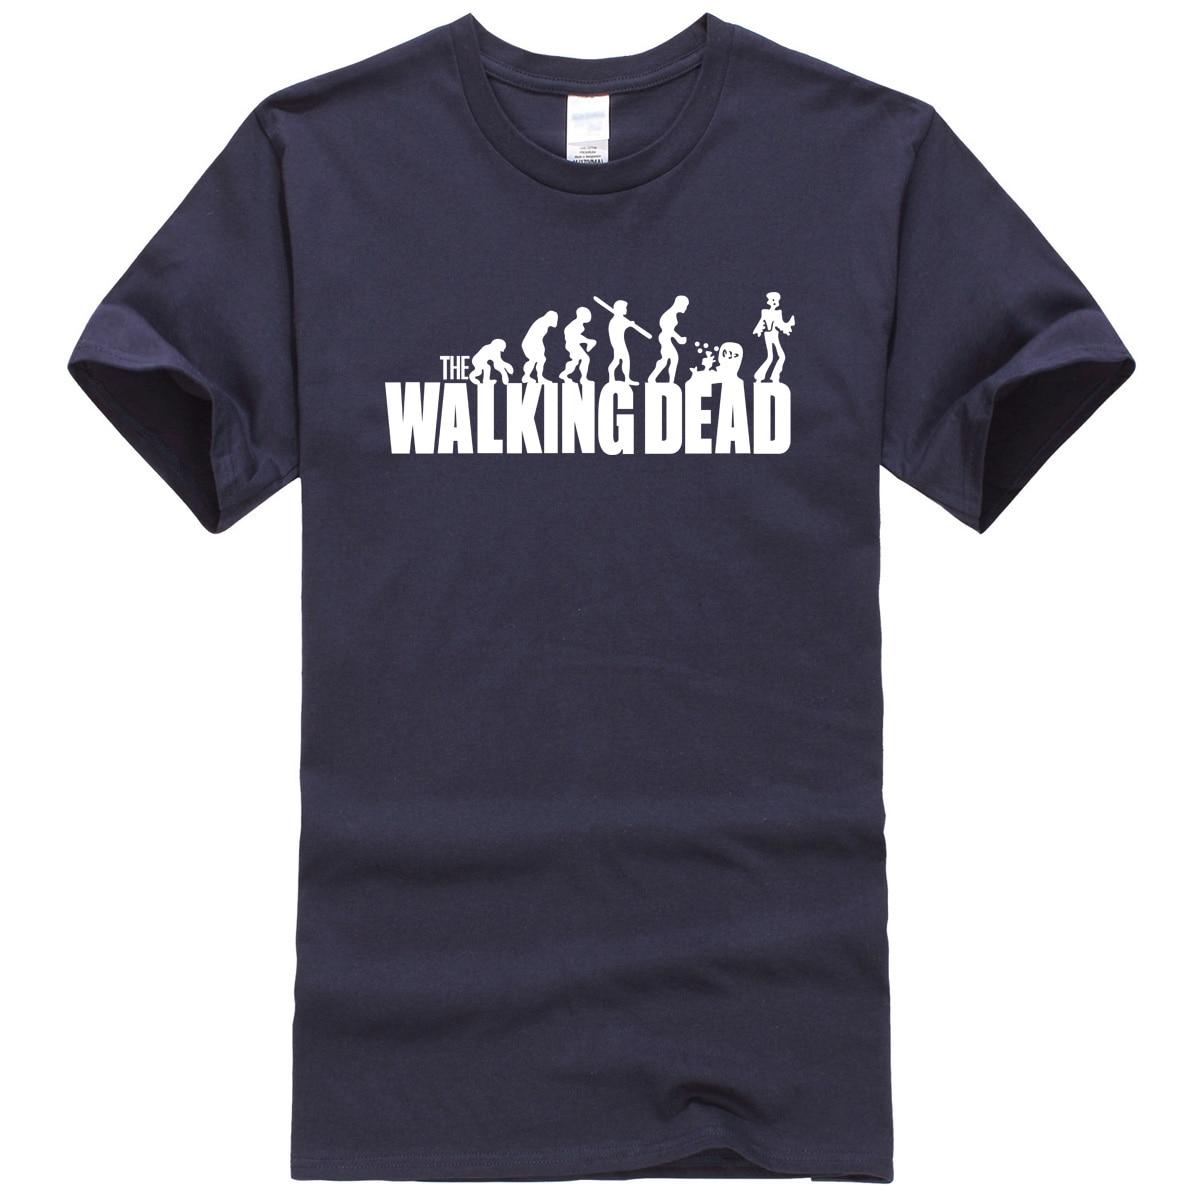 T Shirts For Men 2017 Summer Walking Dead Letter Printed